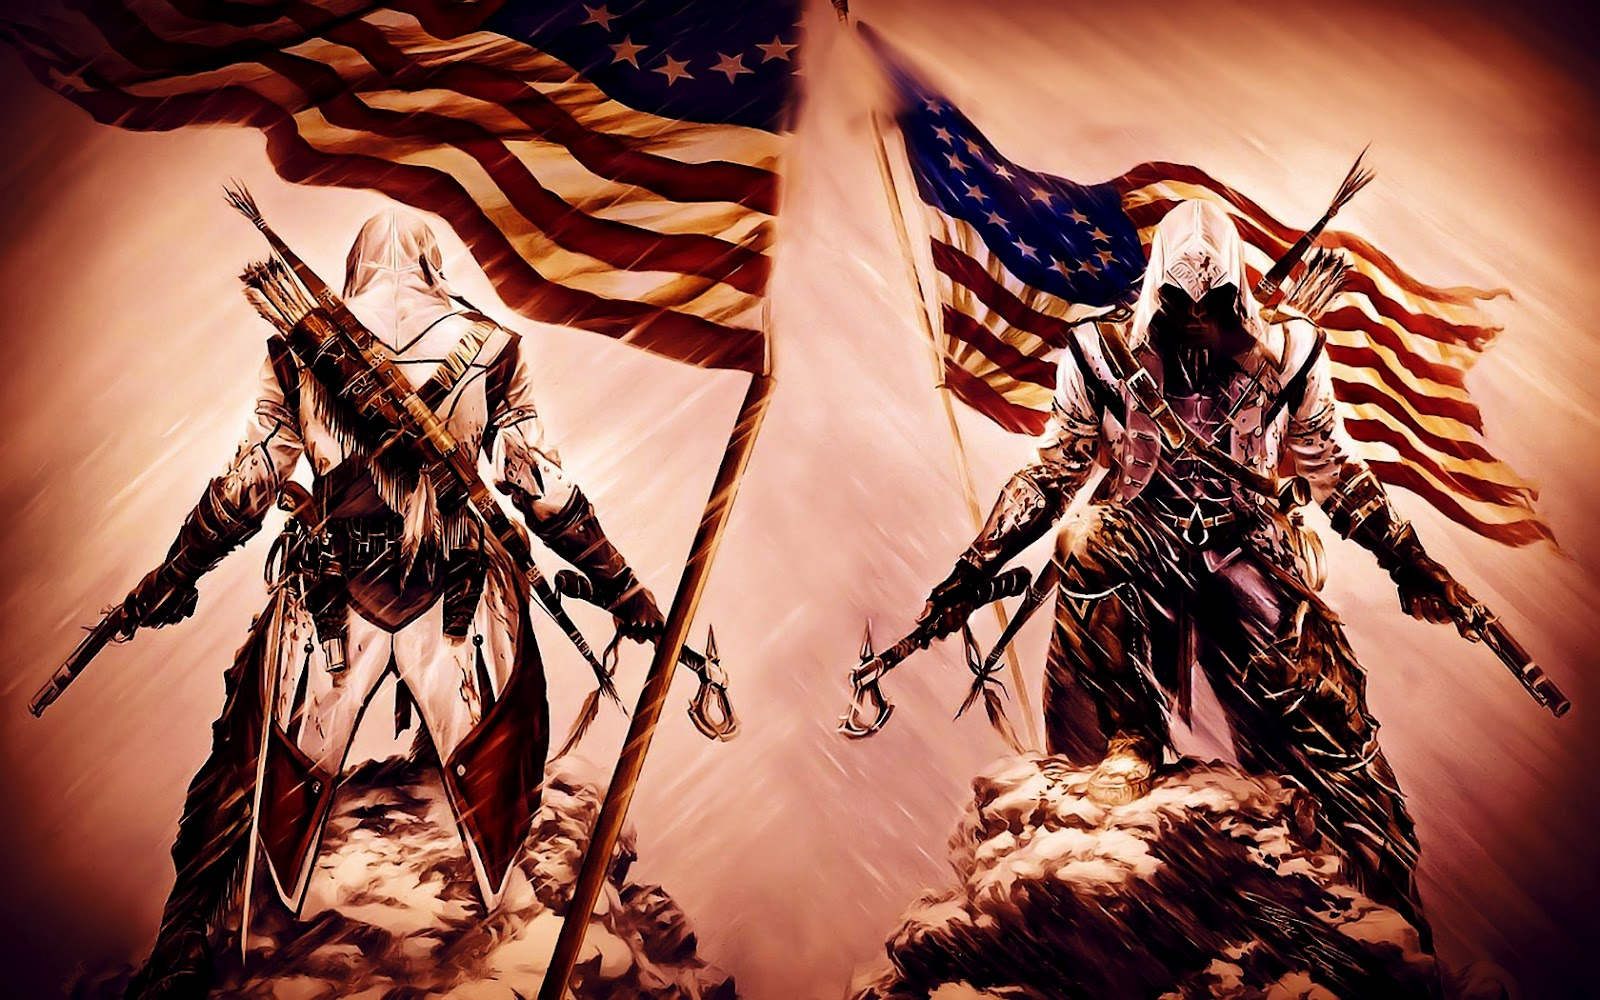 Desktop Wallpapers Assassin S Creed Iii New Game Hd Wallpapers